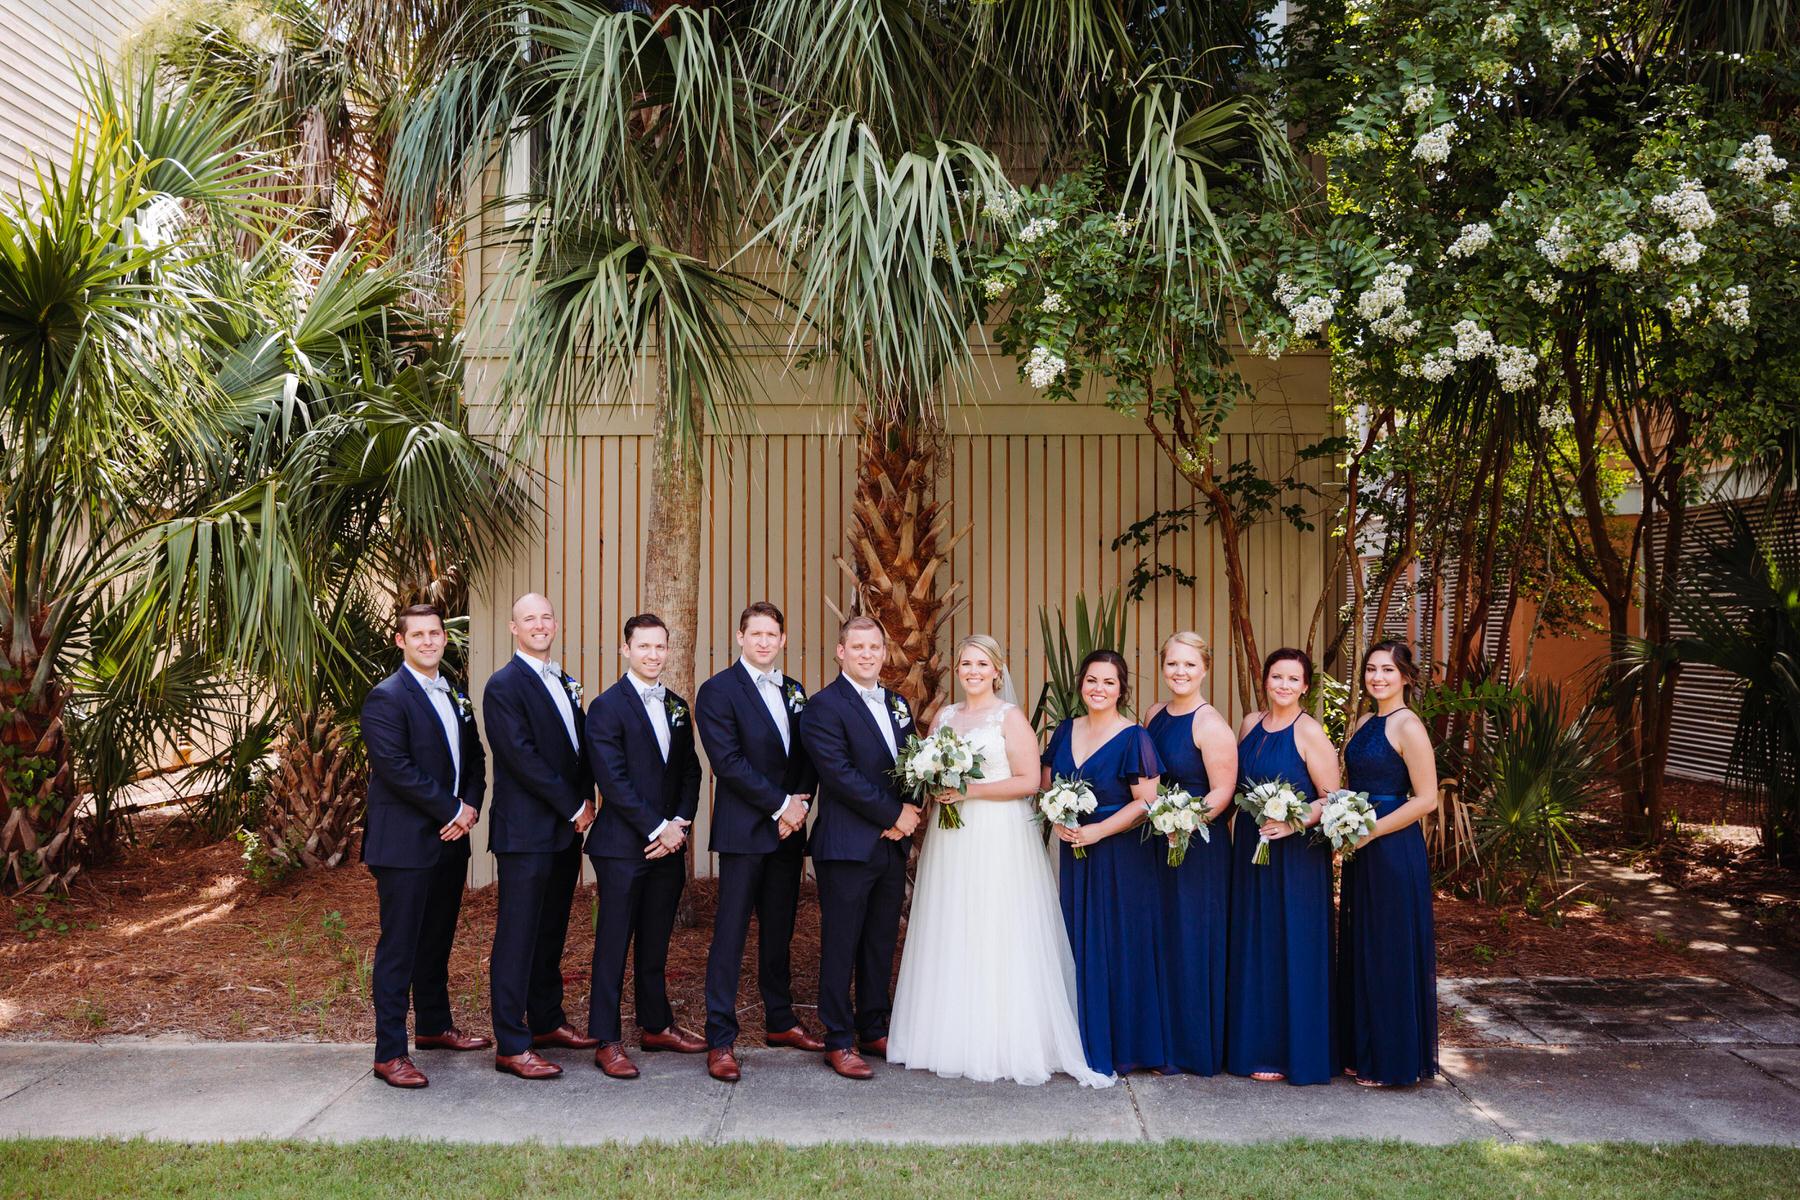 wild-dunes-charleston-isle-of-palms-IOP-wedding-777.JPG